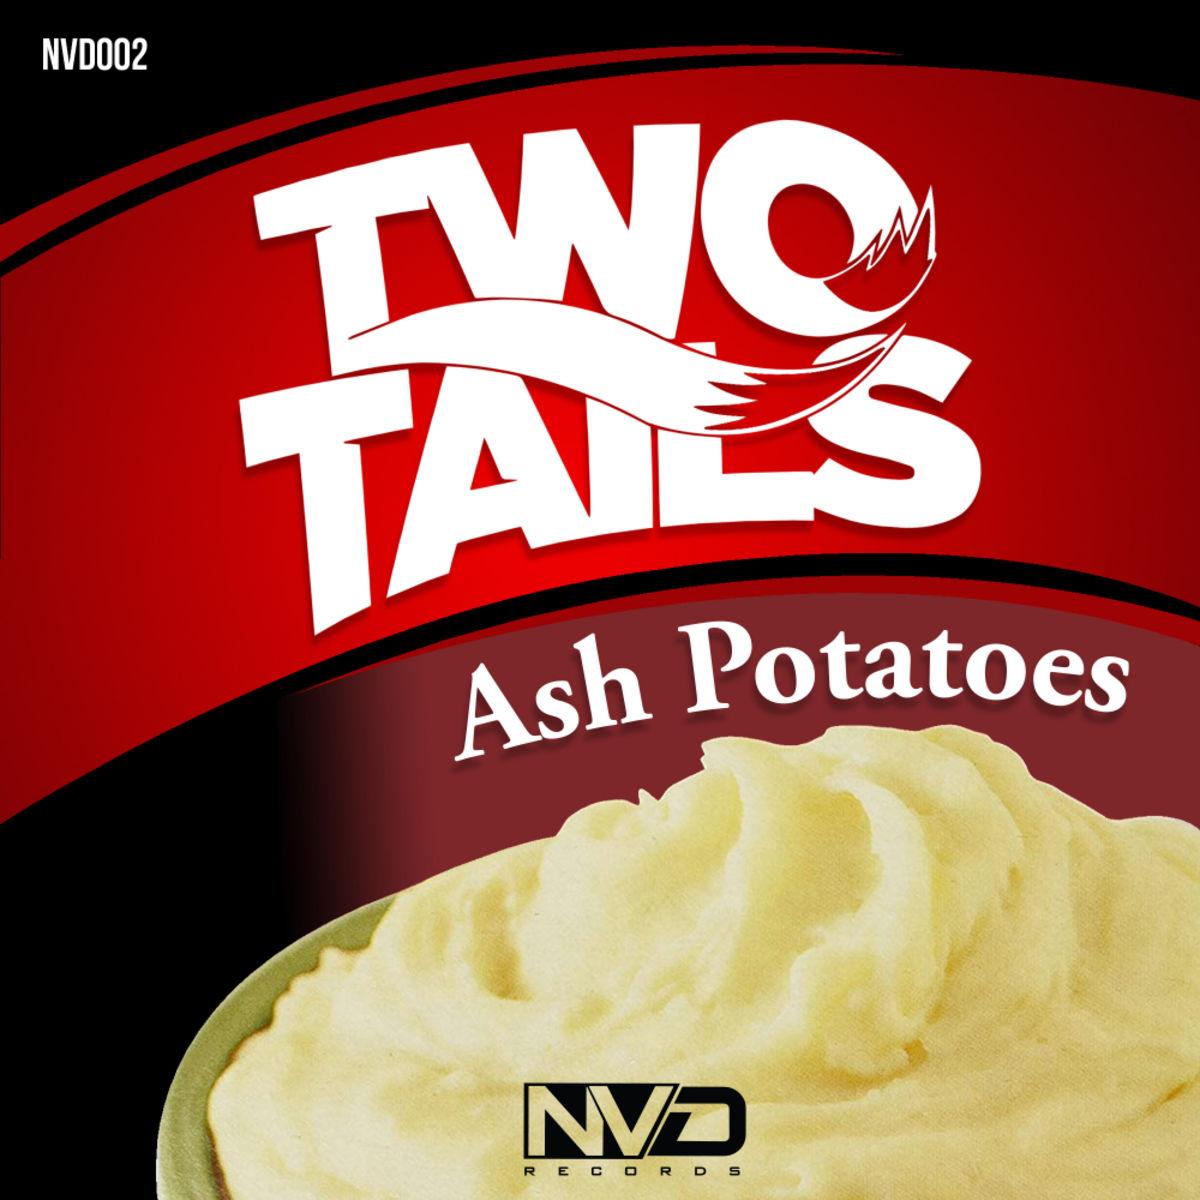 Two Tails - Ash Potatoes  (Original Mix)